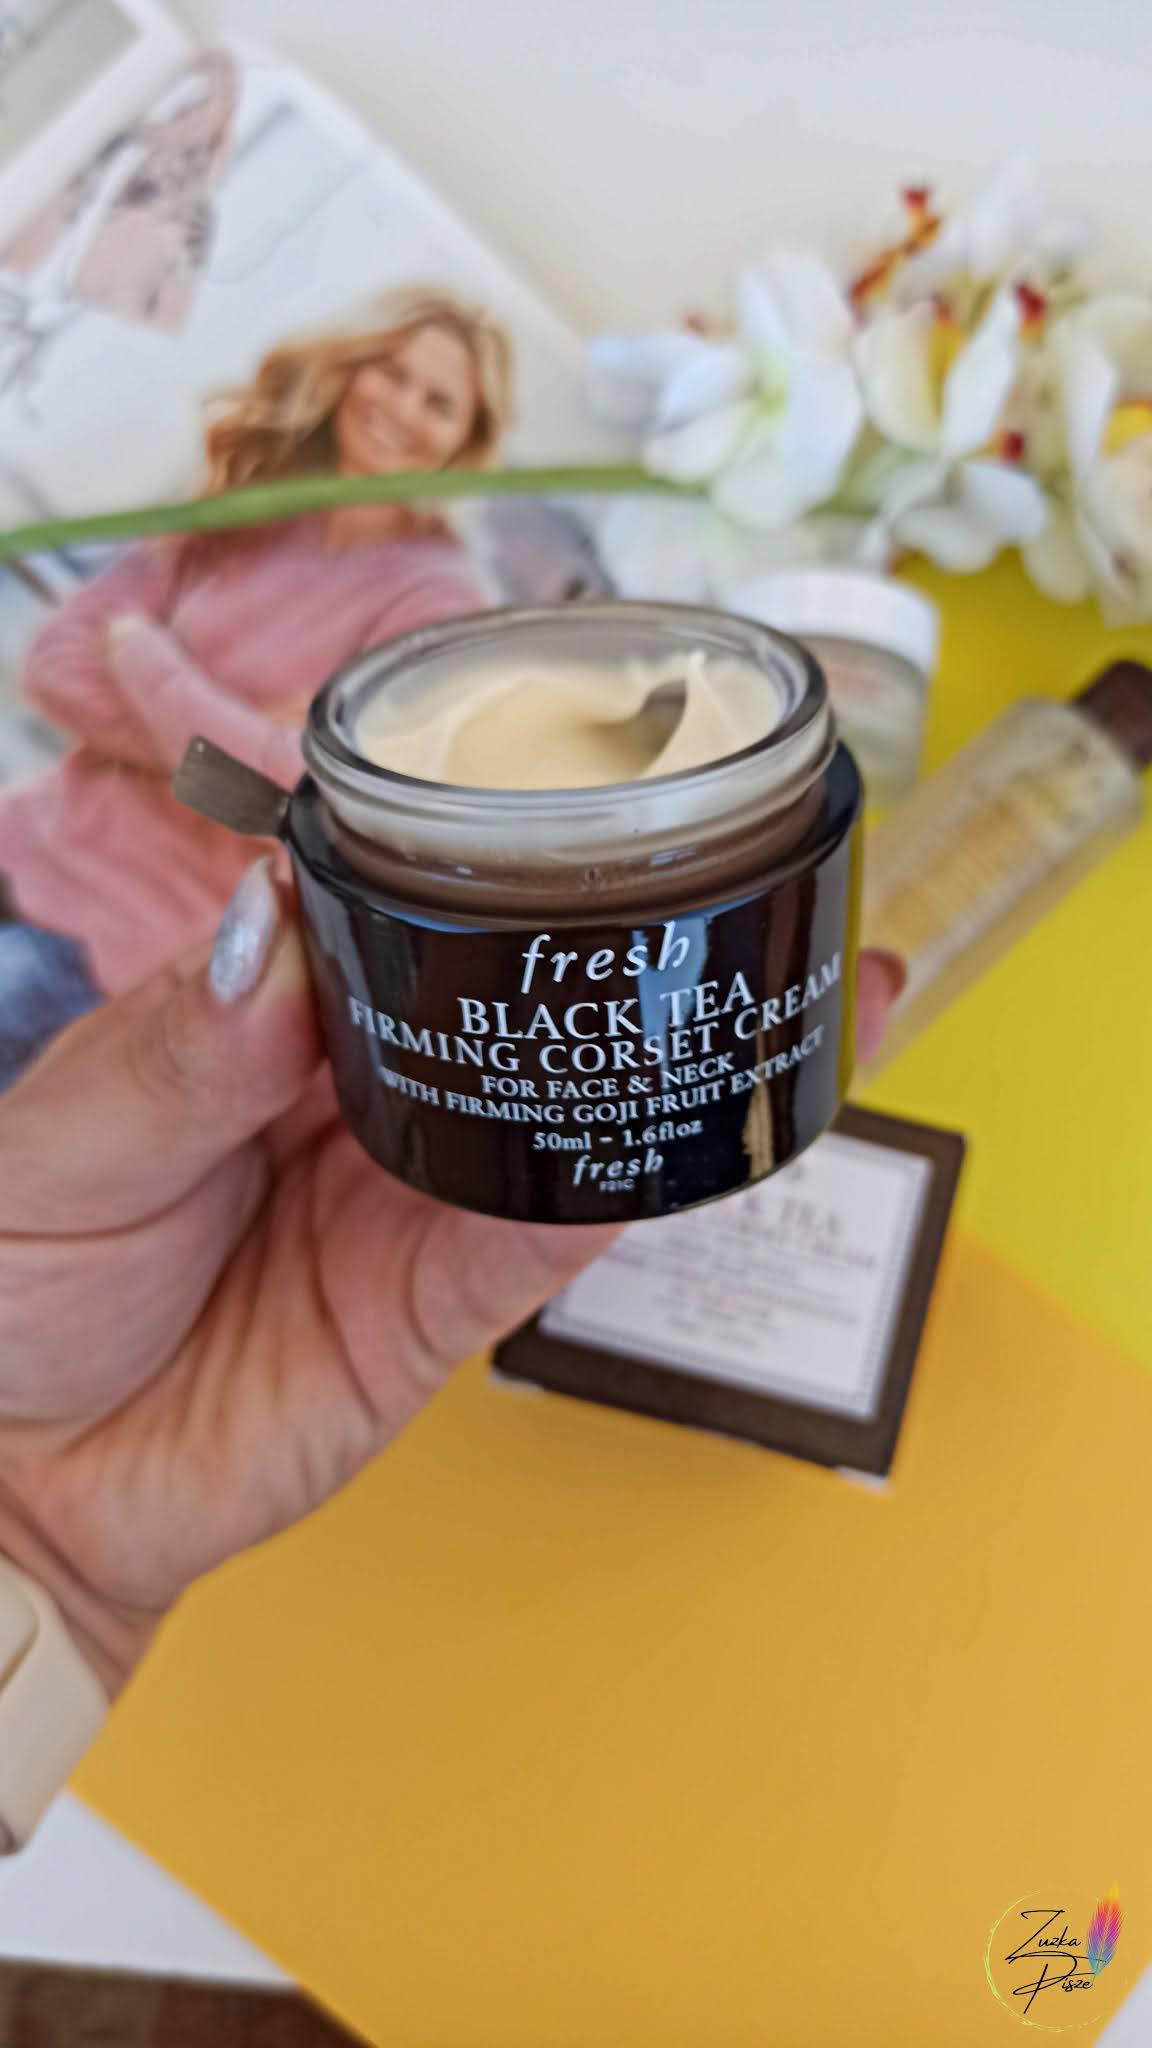 Fresh Black Tea Firming Corset Cream - krem ujędrniający